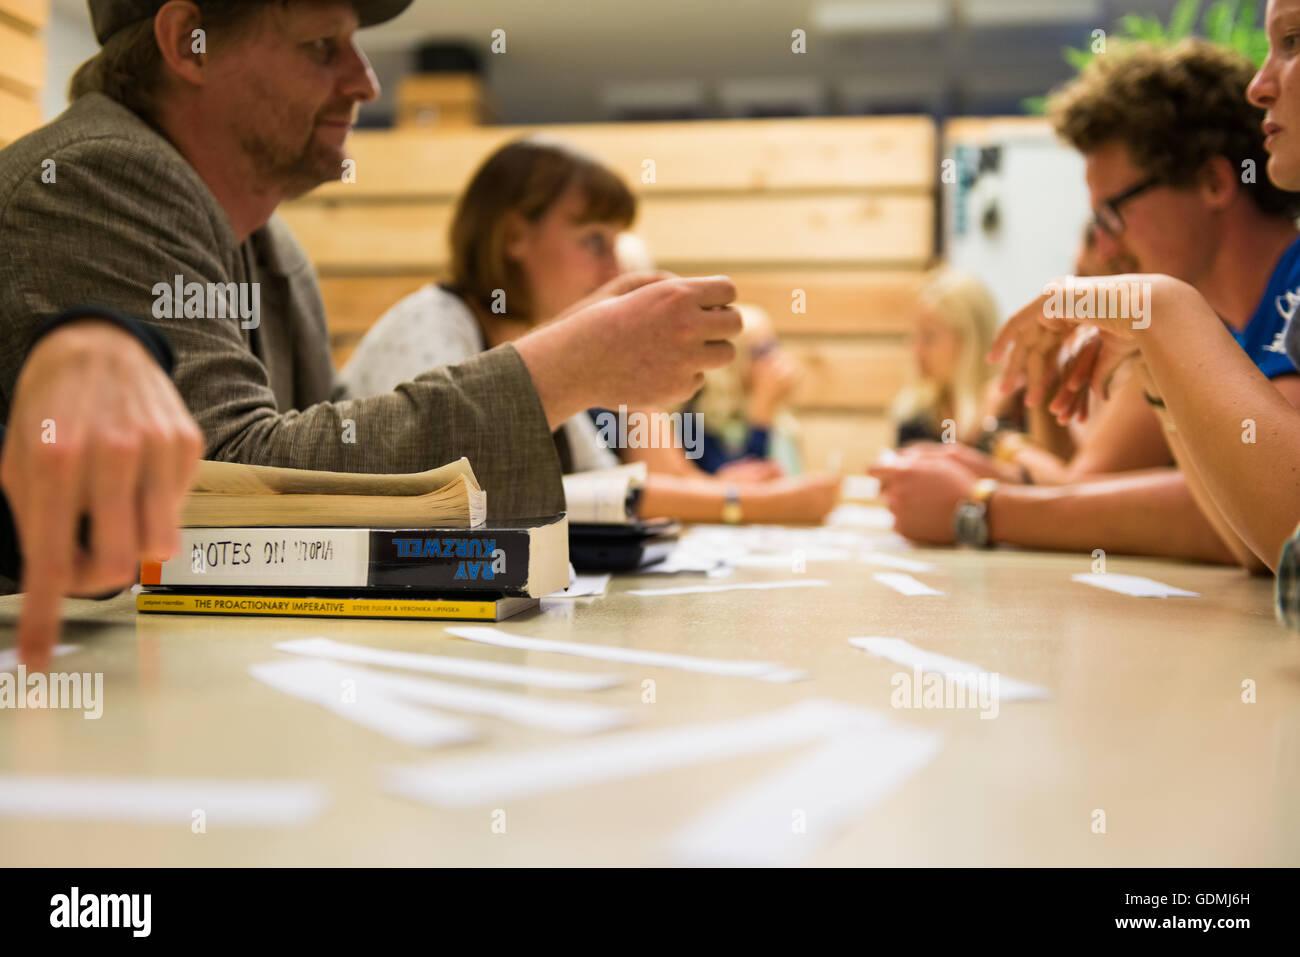 Notes on utopia, interactive performance at Festival Performa Platforma, Maribor, Slovenia, 2015 - Stock Image